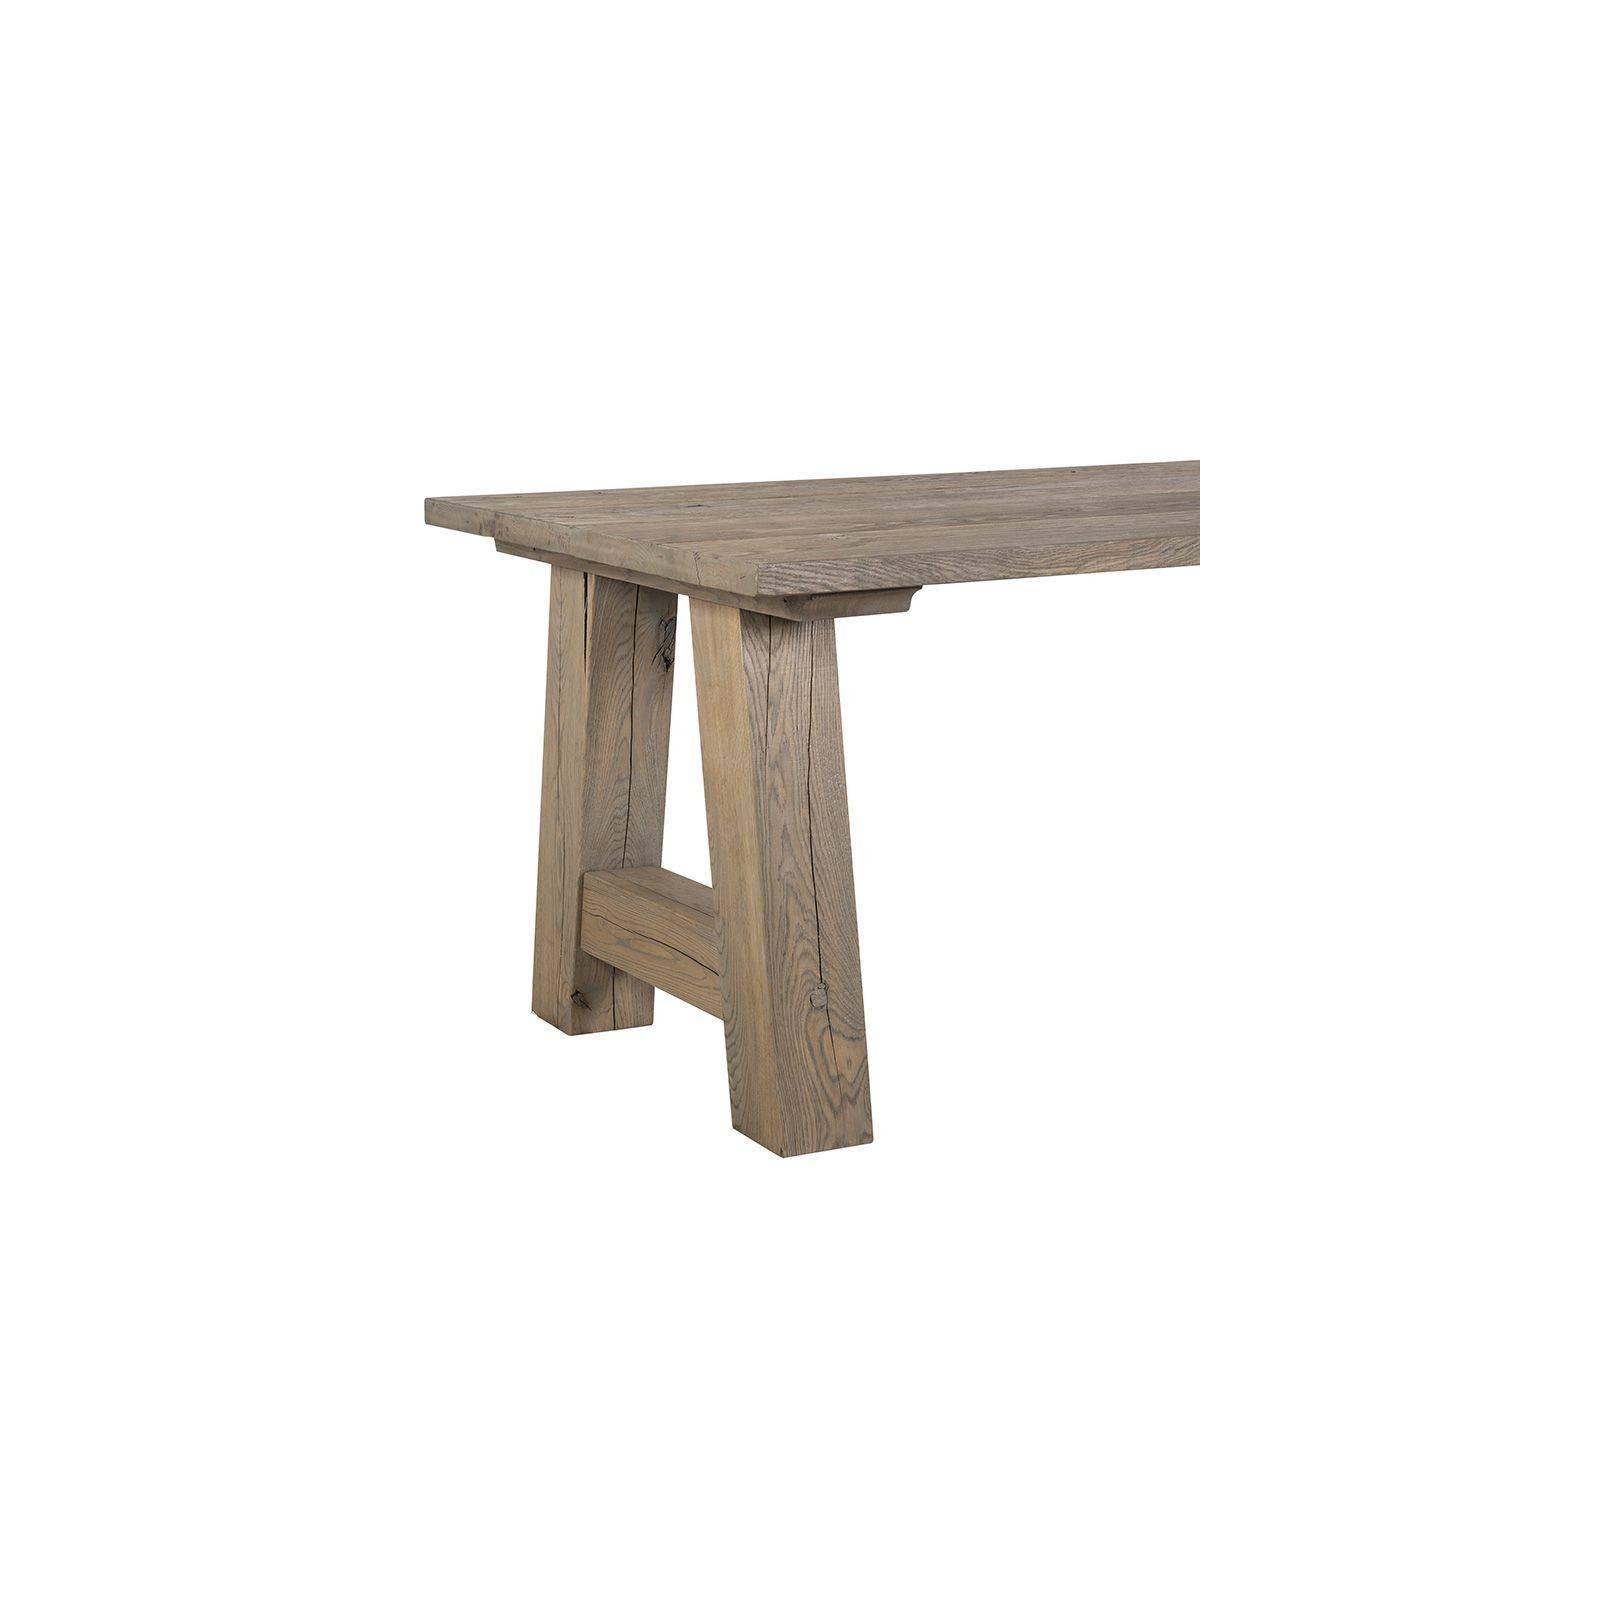 Table de salle Porte Victoria Chêne - achat table en chêne massif